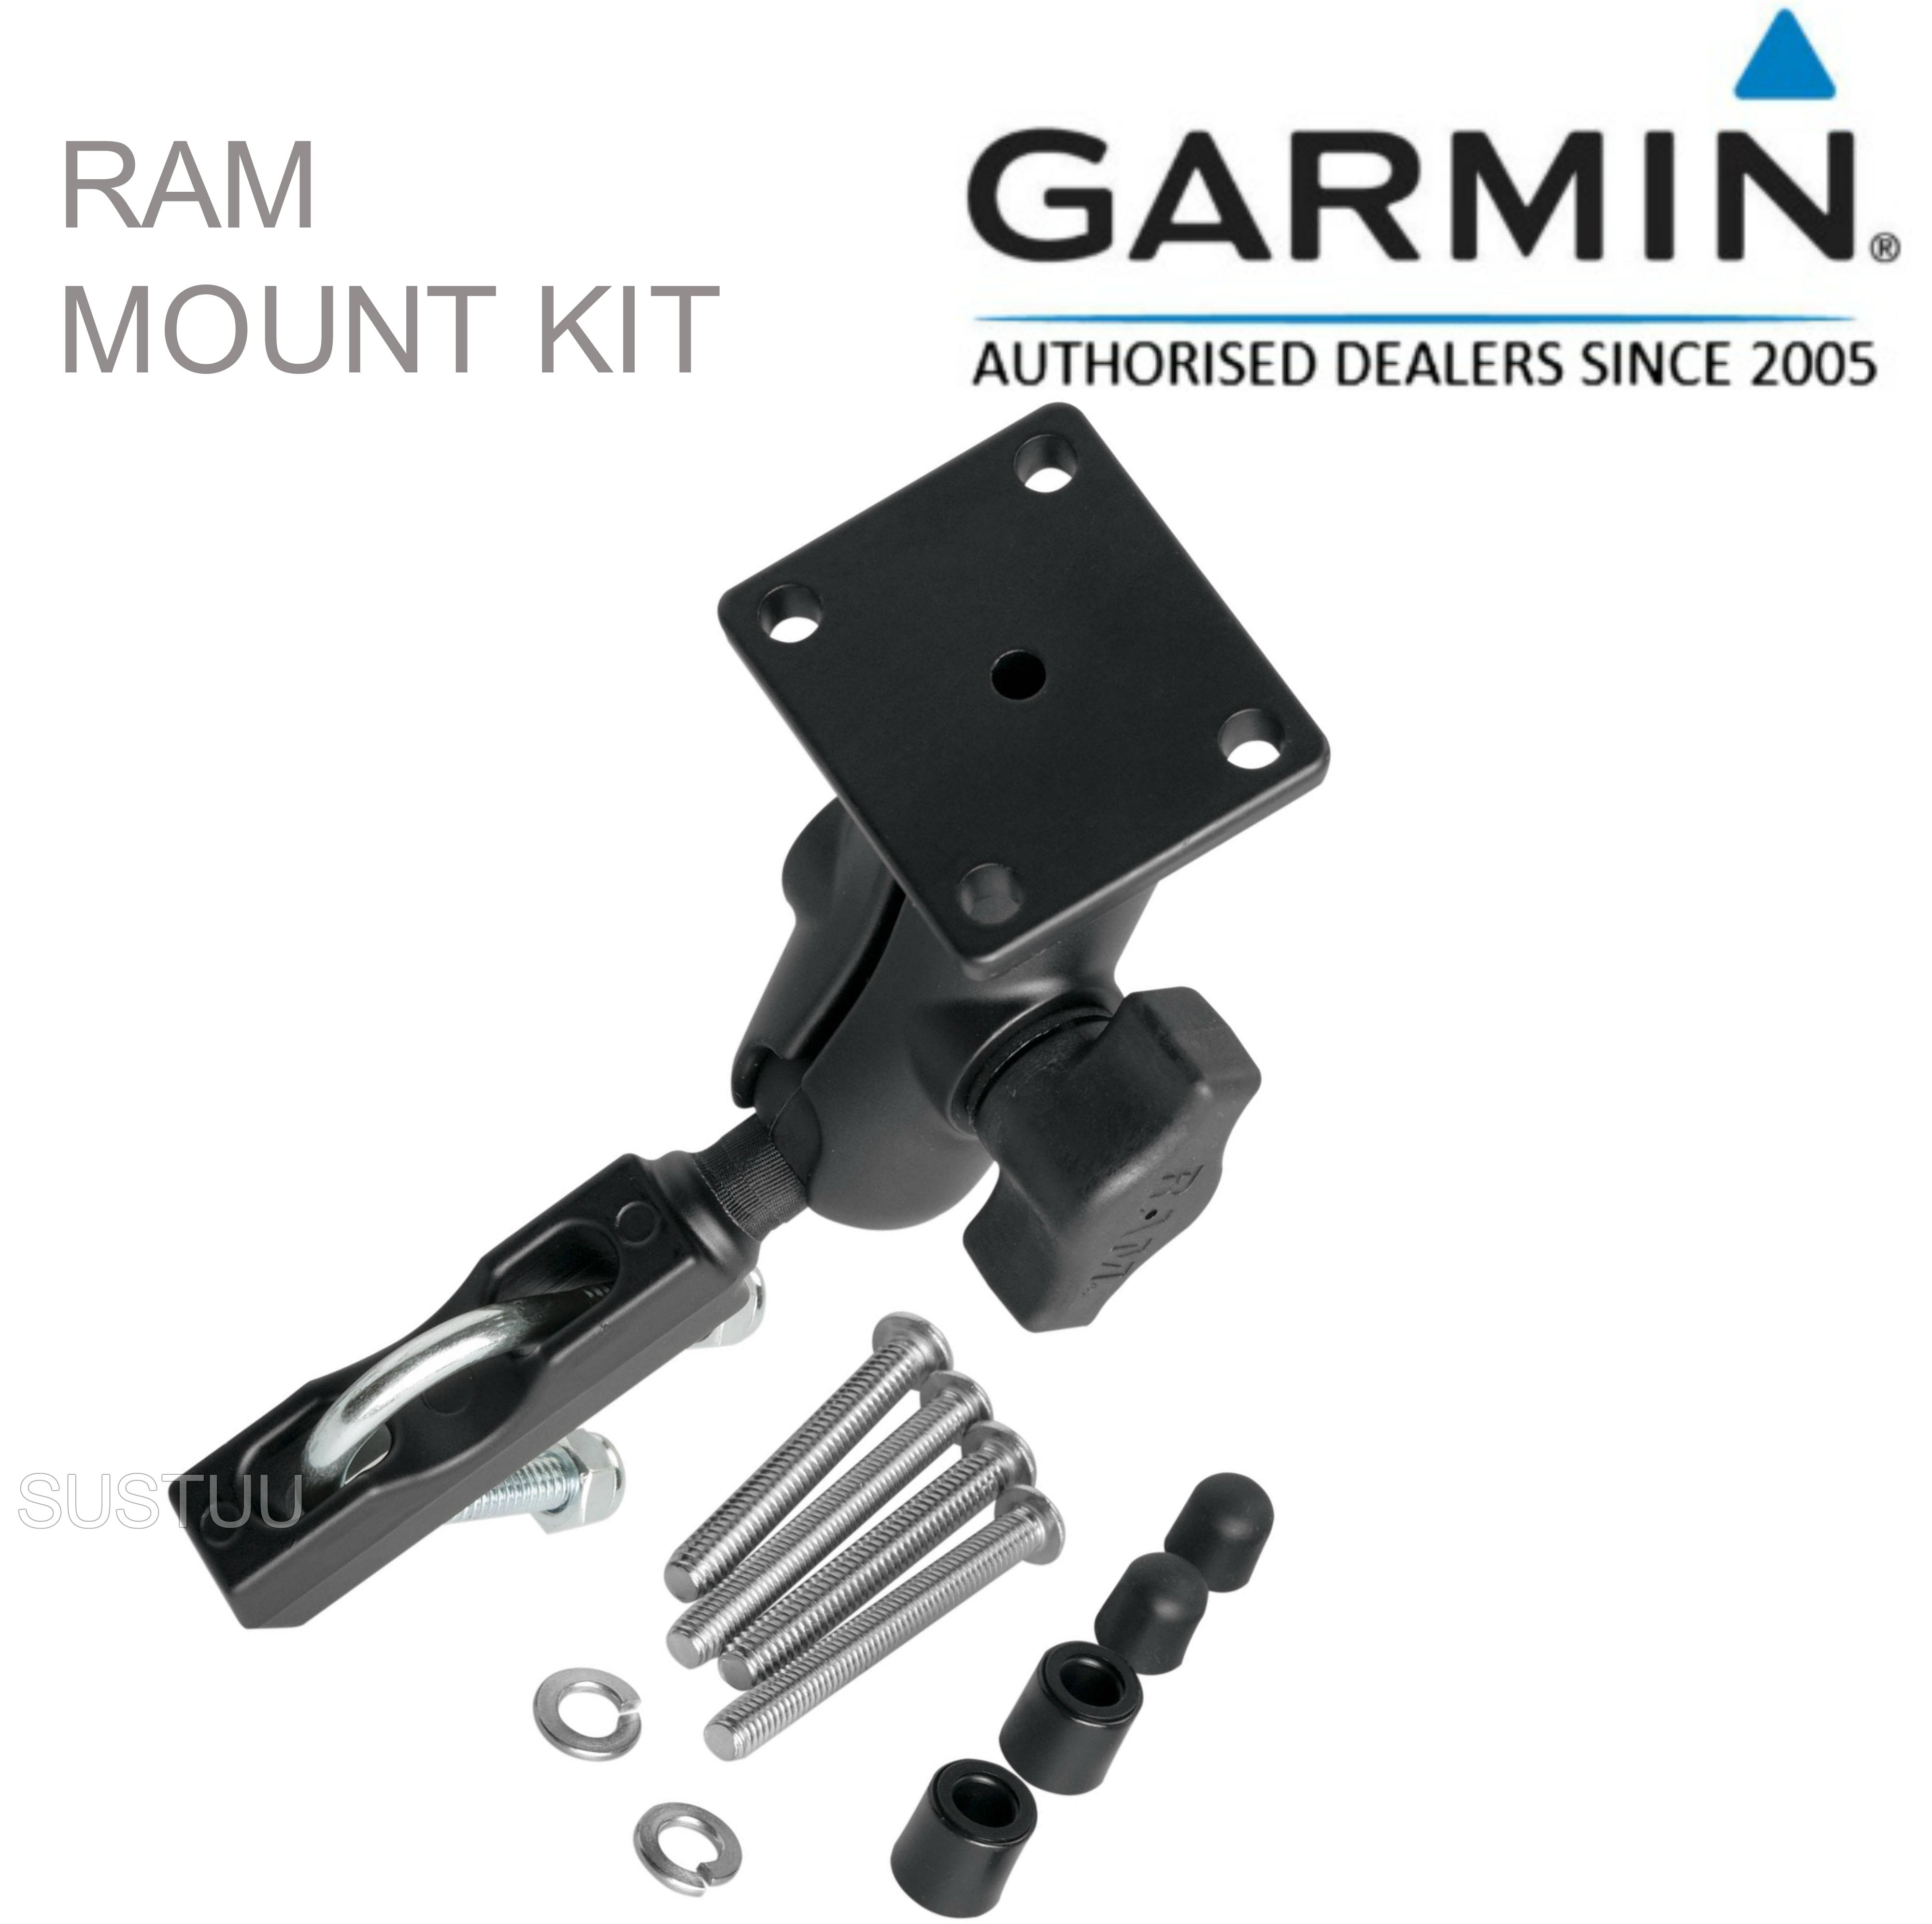 Garmin Ram Motorcycle Bike Mount Holder Kit | For Montana 600 610 650 680 & Zumo 590 660